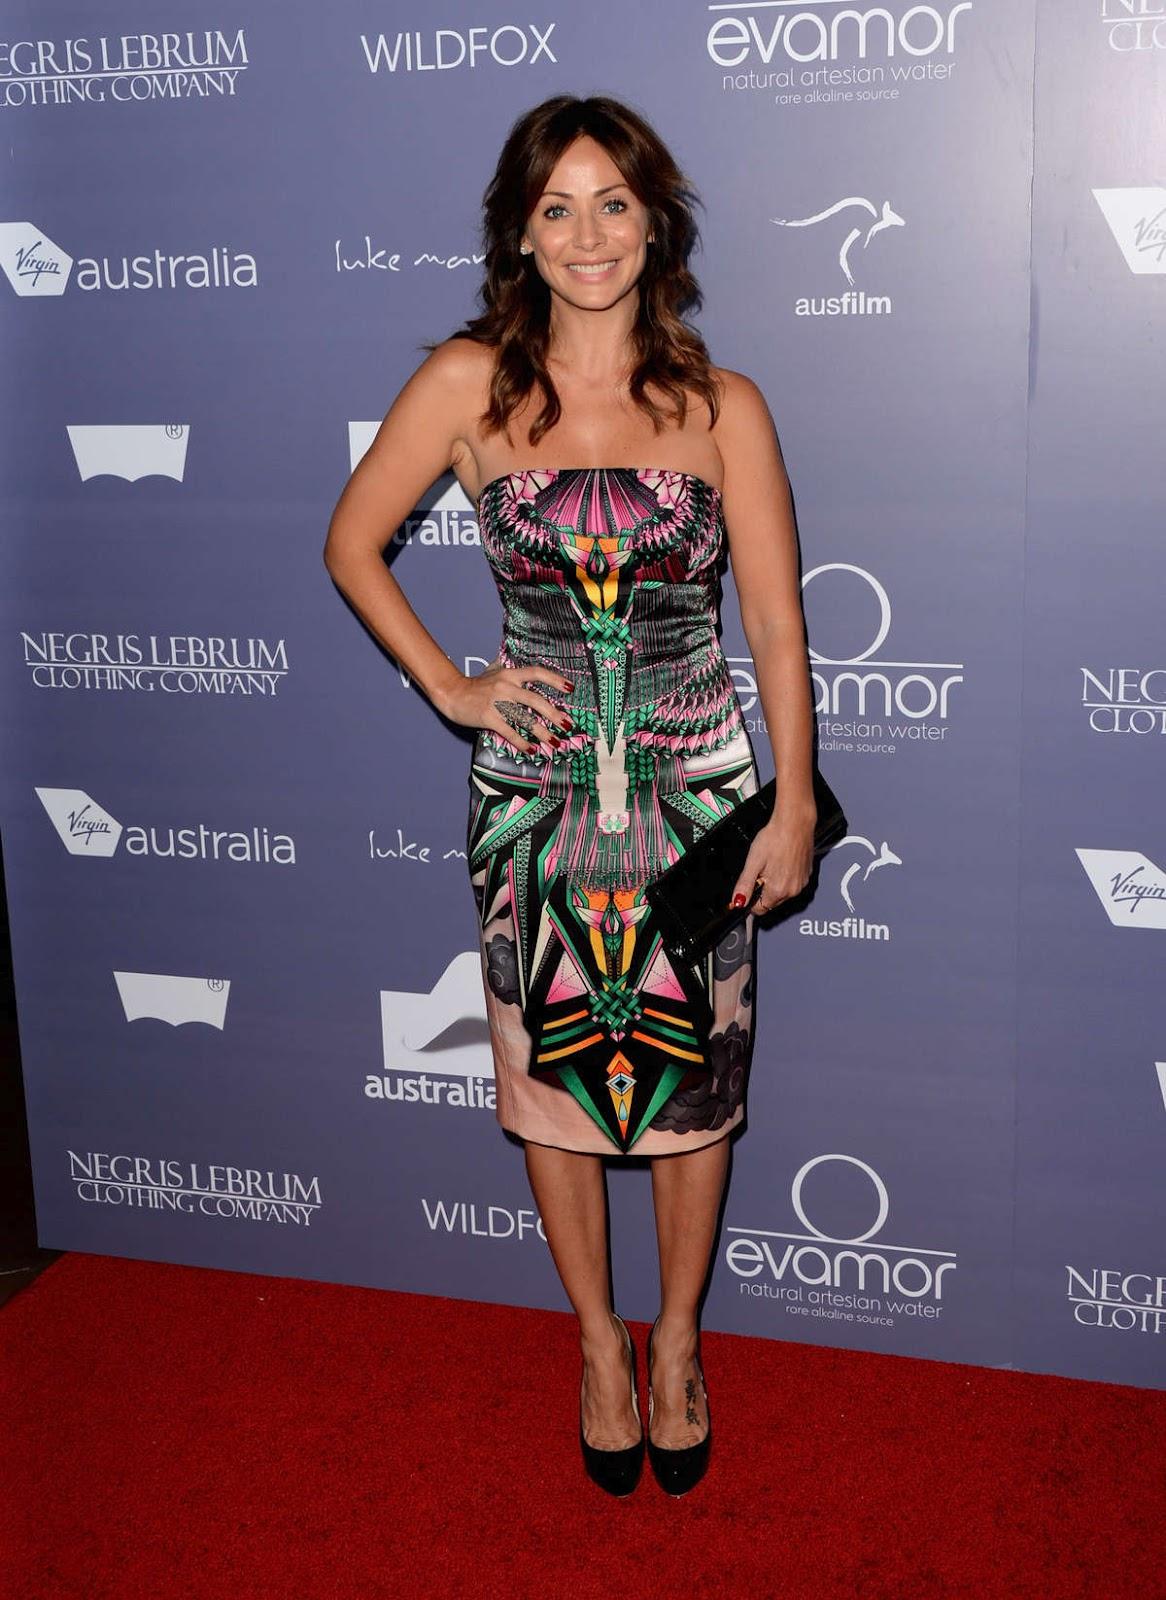 http://3.bp.blogspot.com/-sl-7Y6Xsu7Q/T-yFBd1sosI/AAAAAAAAHMA/iXFv6i8FEjE/s1600/Natalie+Imbruglia+Australians+In+Film+Awards+Dinner+01.jpg